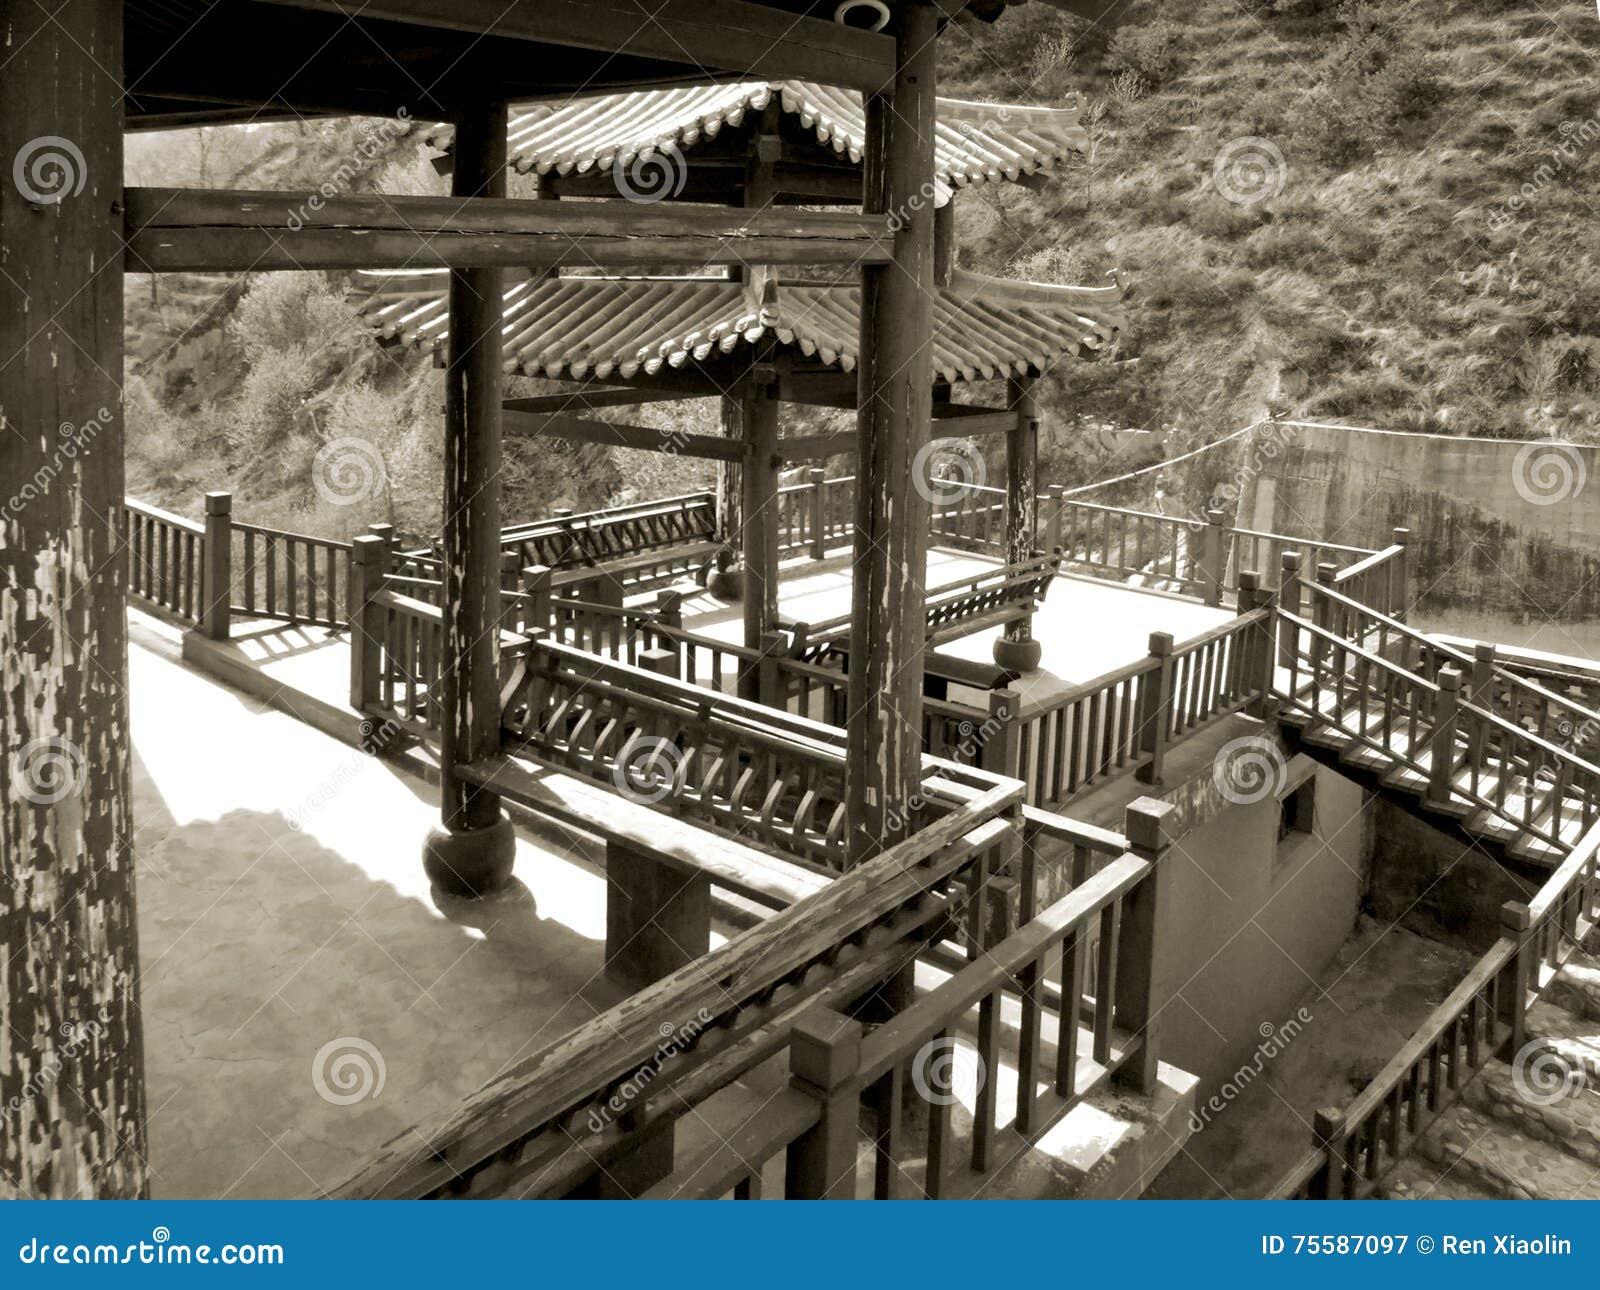 oriental garden stock image. image of architecture, oriental